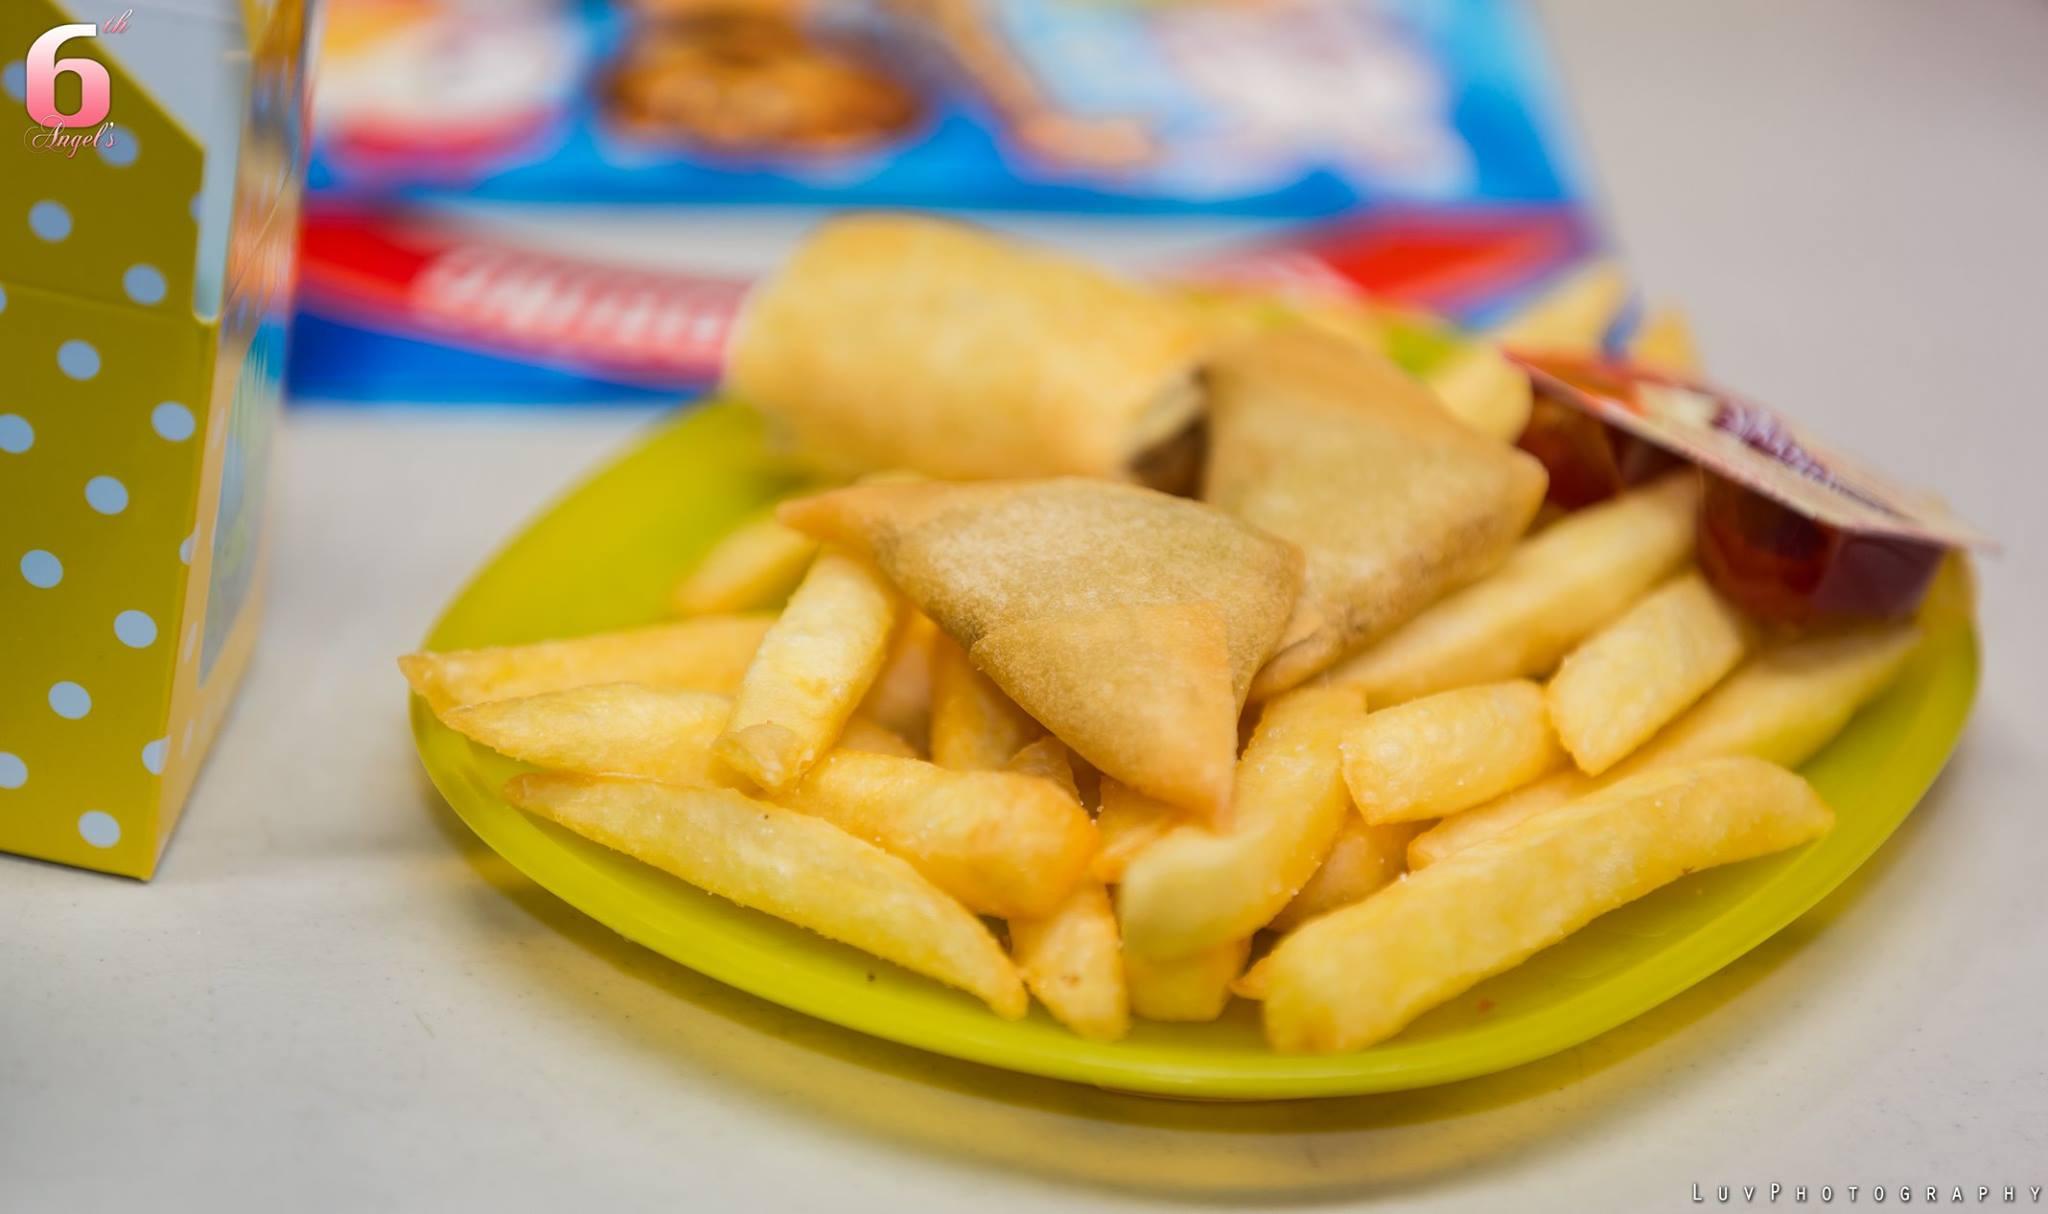 Cafe Menu - Food & Drinks Pricing/Information